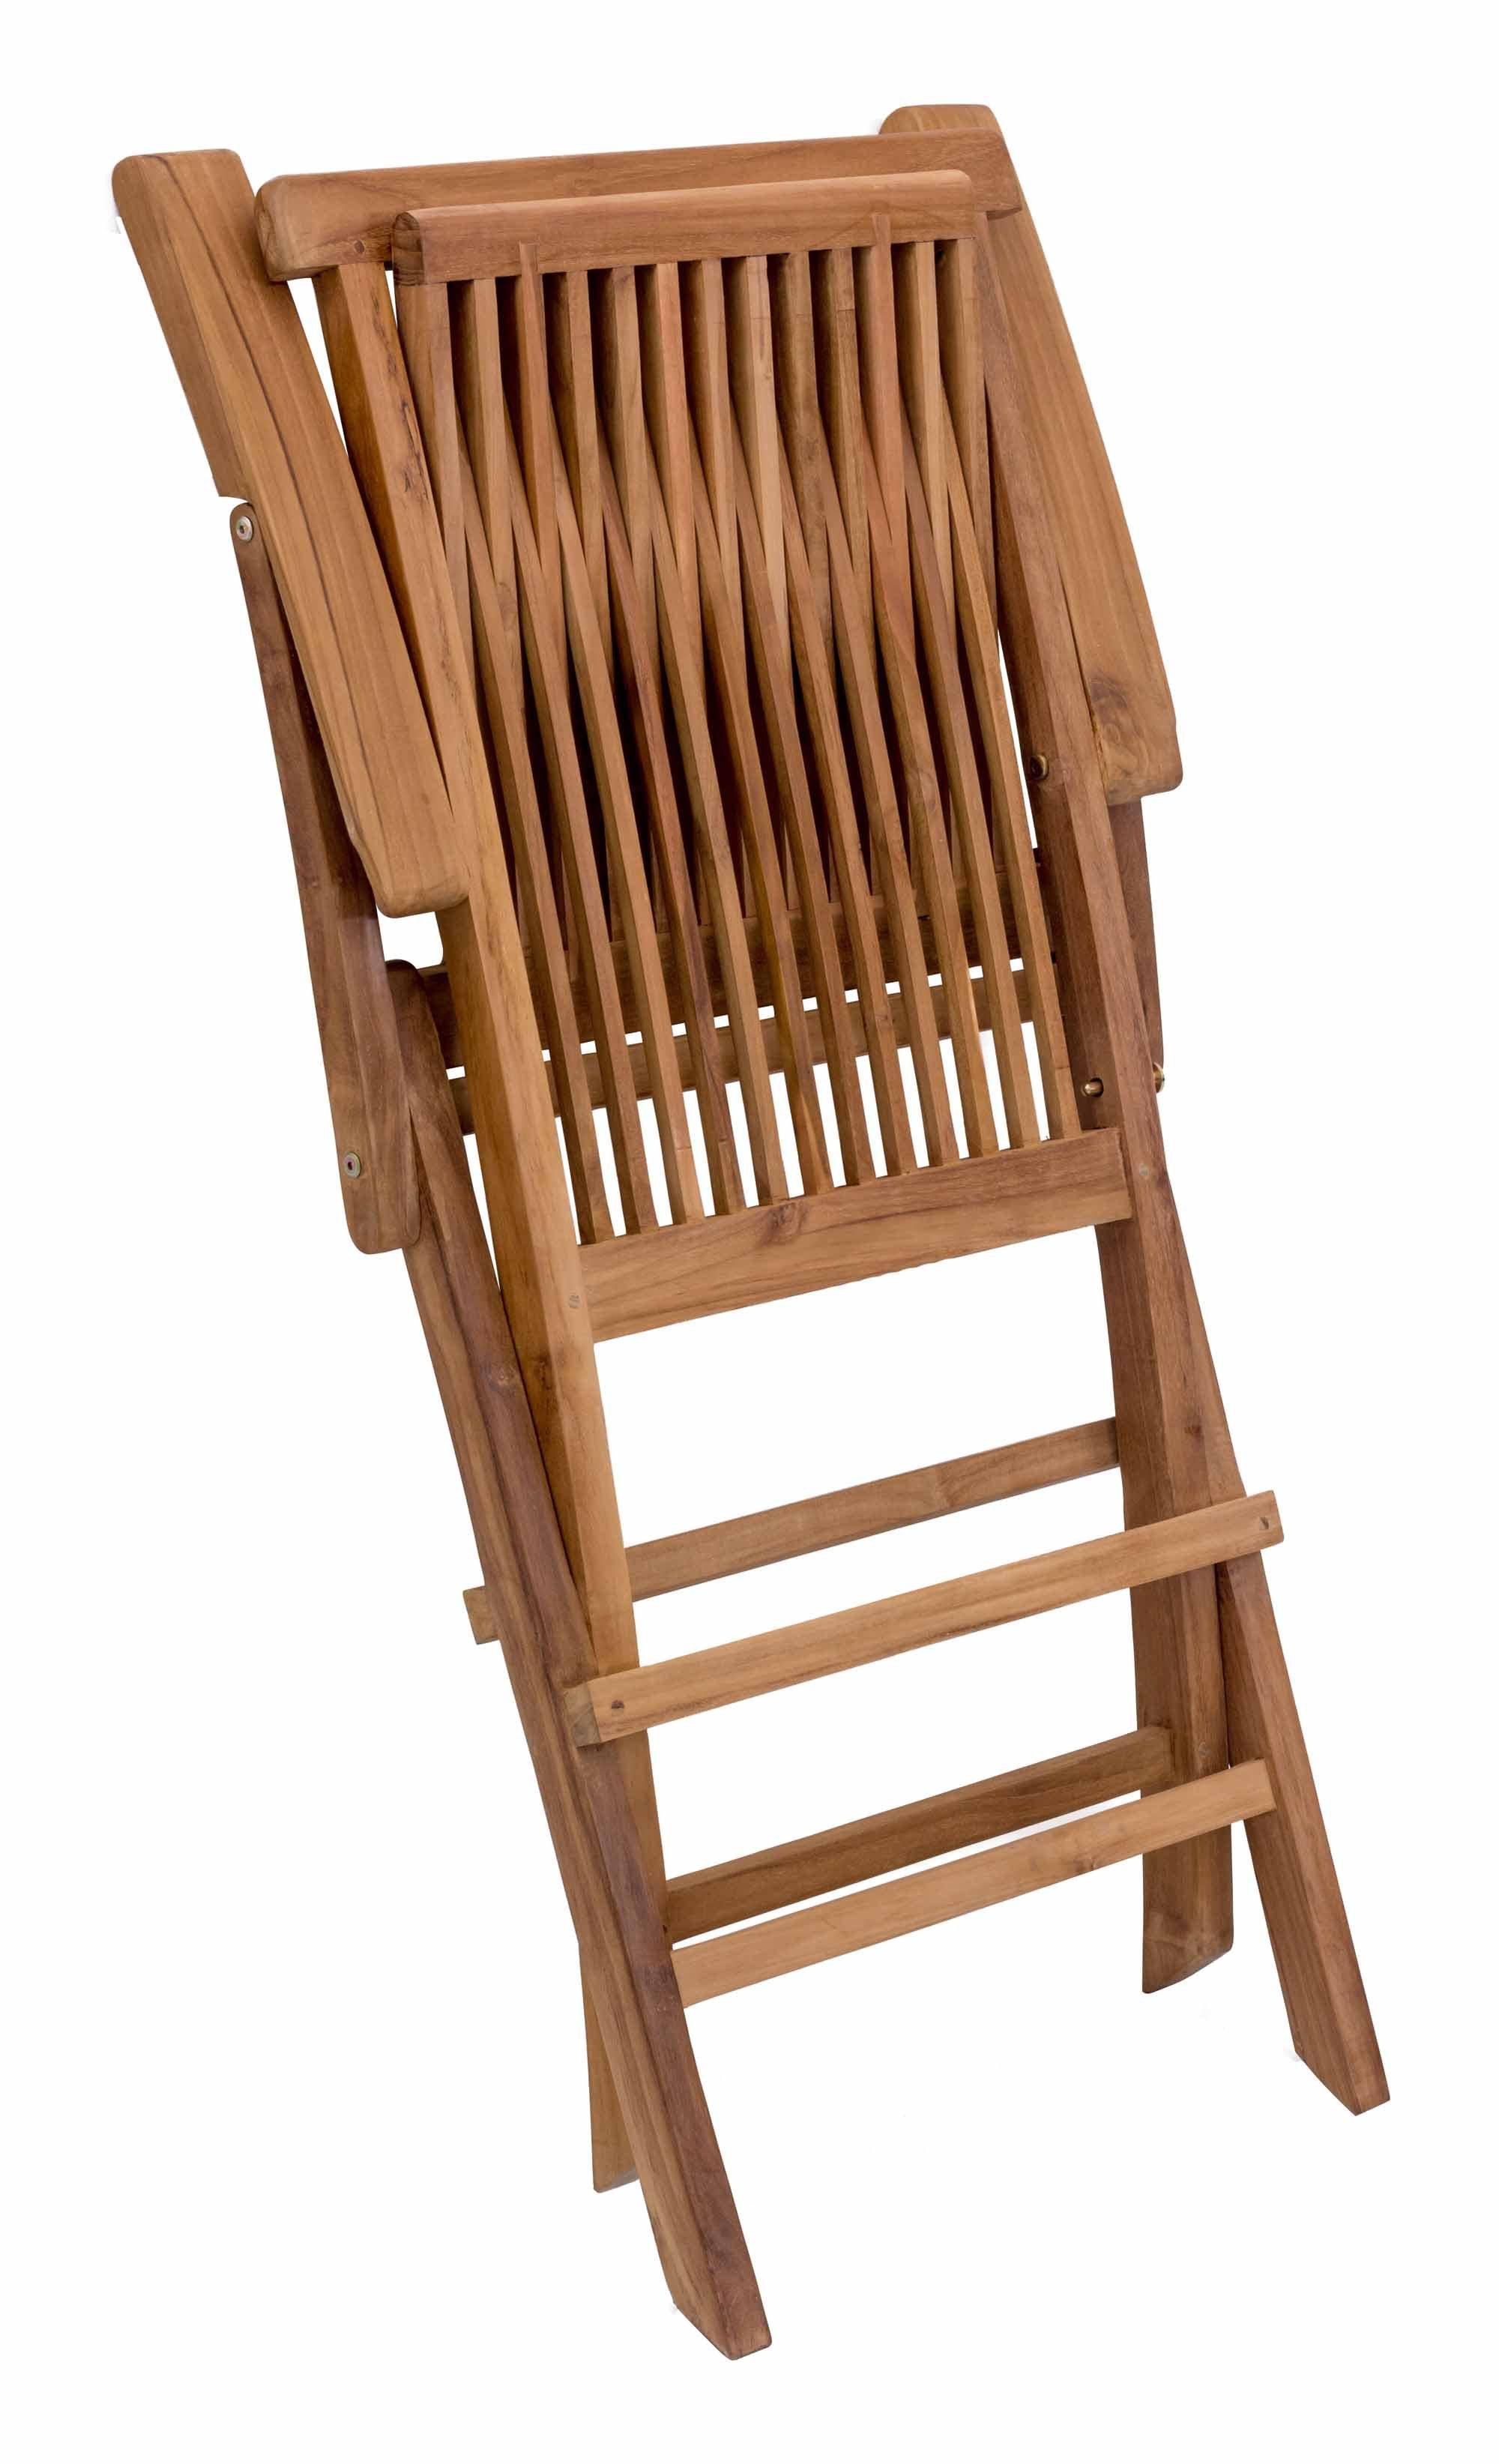 Regatta Folding Arm Chair Natural Set of 2 by Zuo Modern